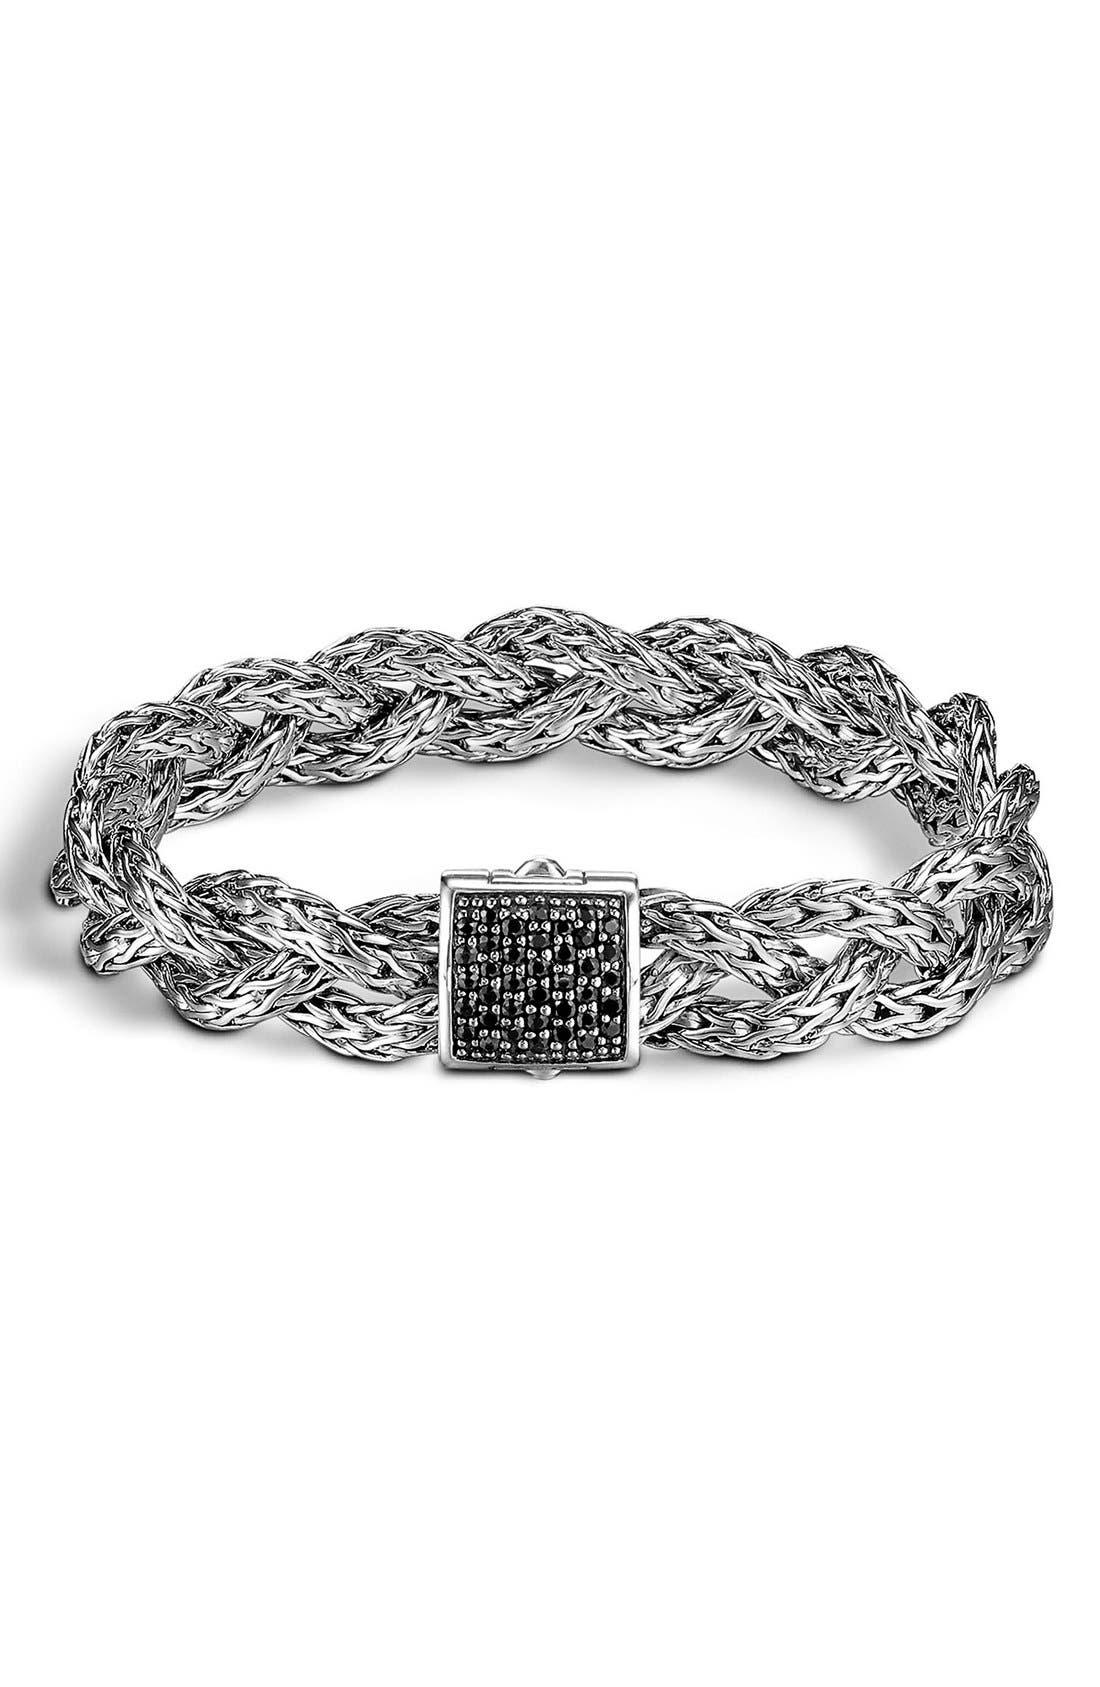 John Hardy 'Braided Chain' Semiprecious Stone Bracelet